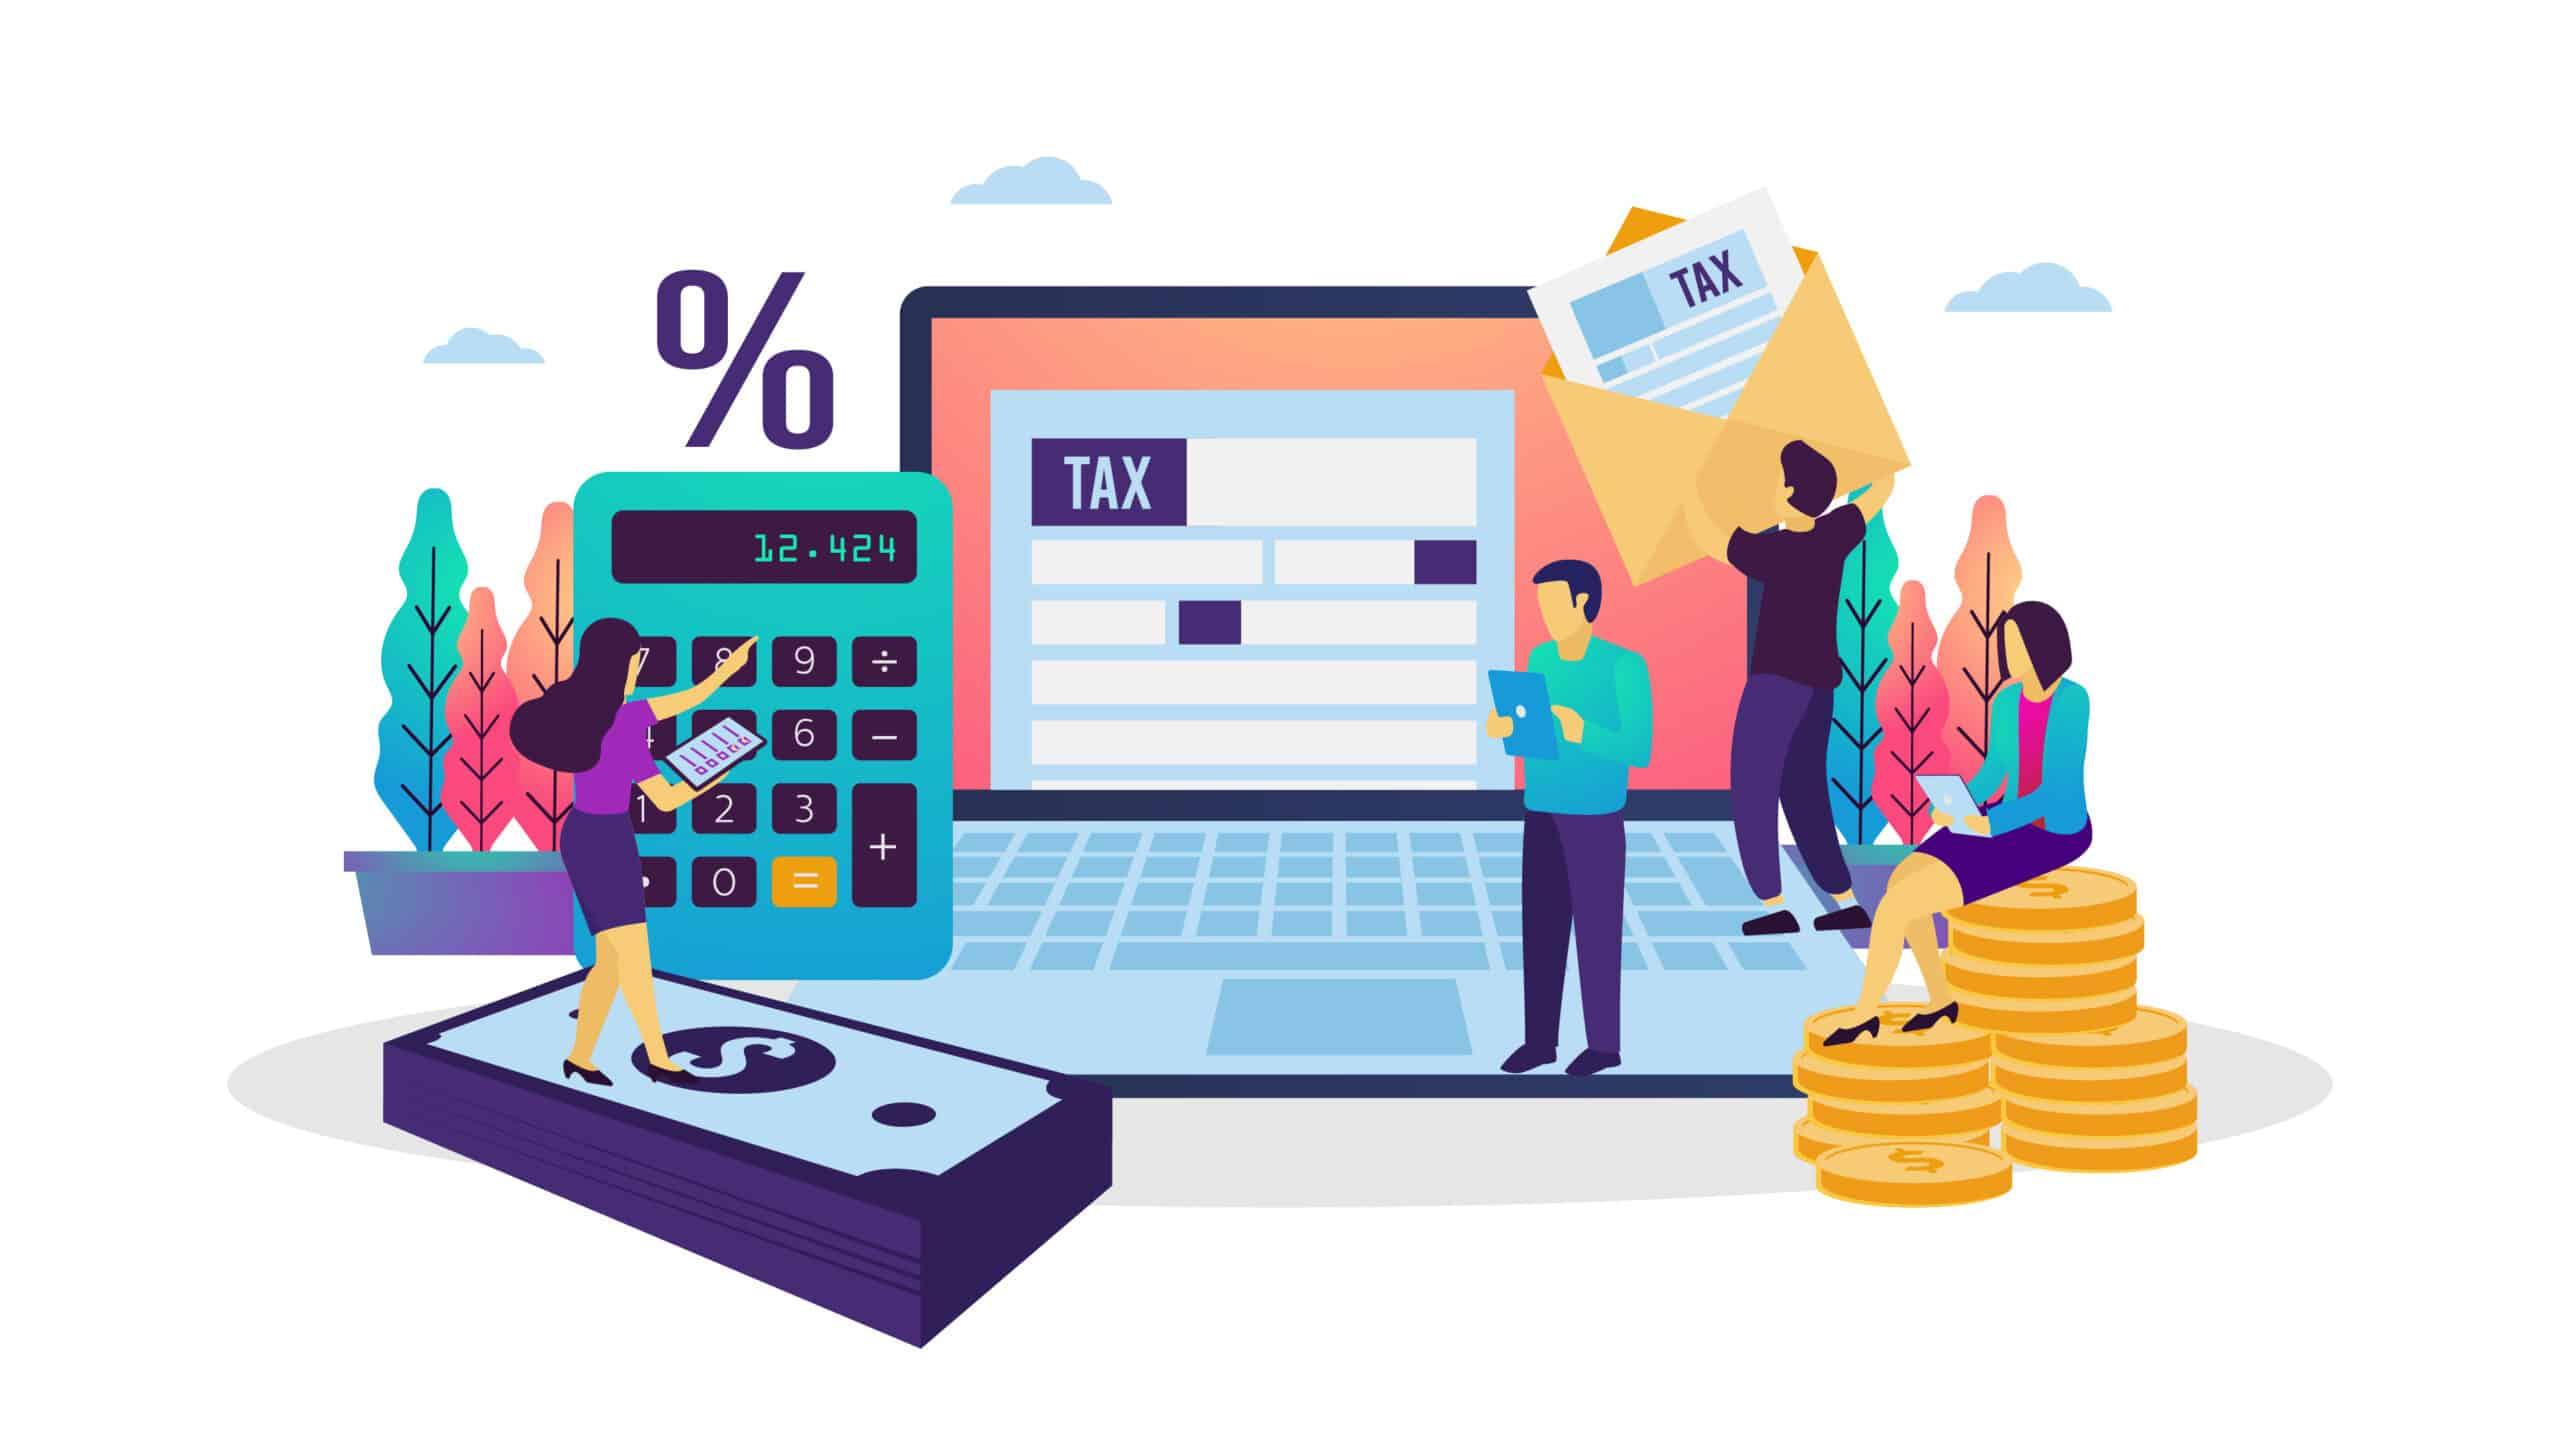 SwiftBooks Accounting tax image